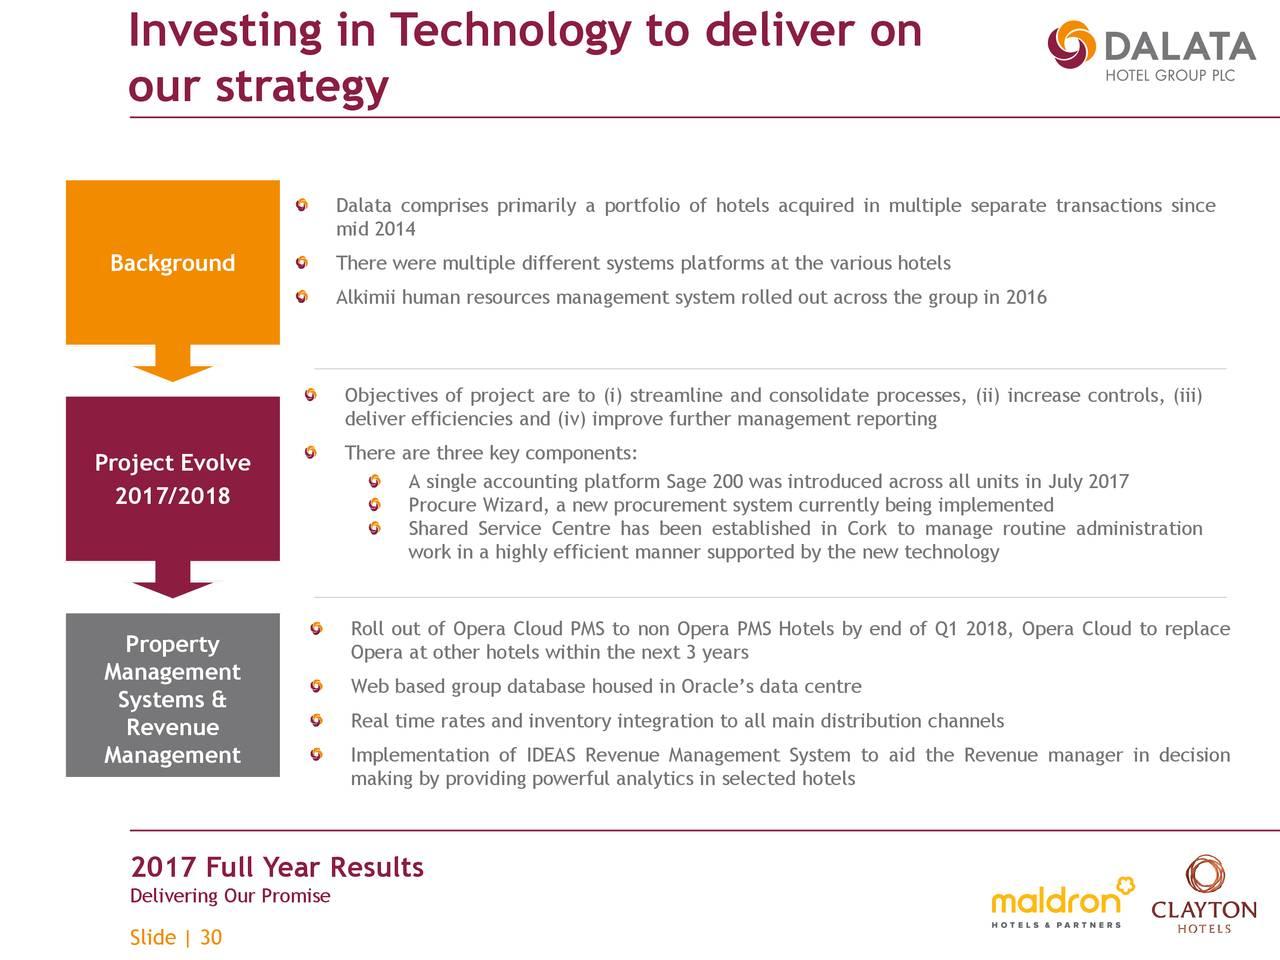 Dalata Hotel Group Plc 2017 Q4 Results Earnings Call